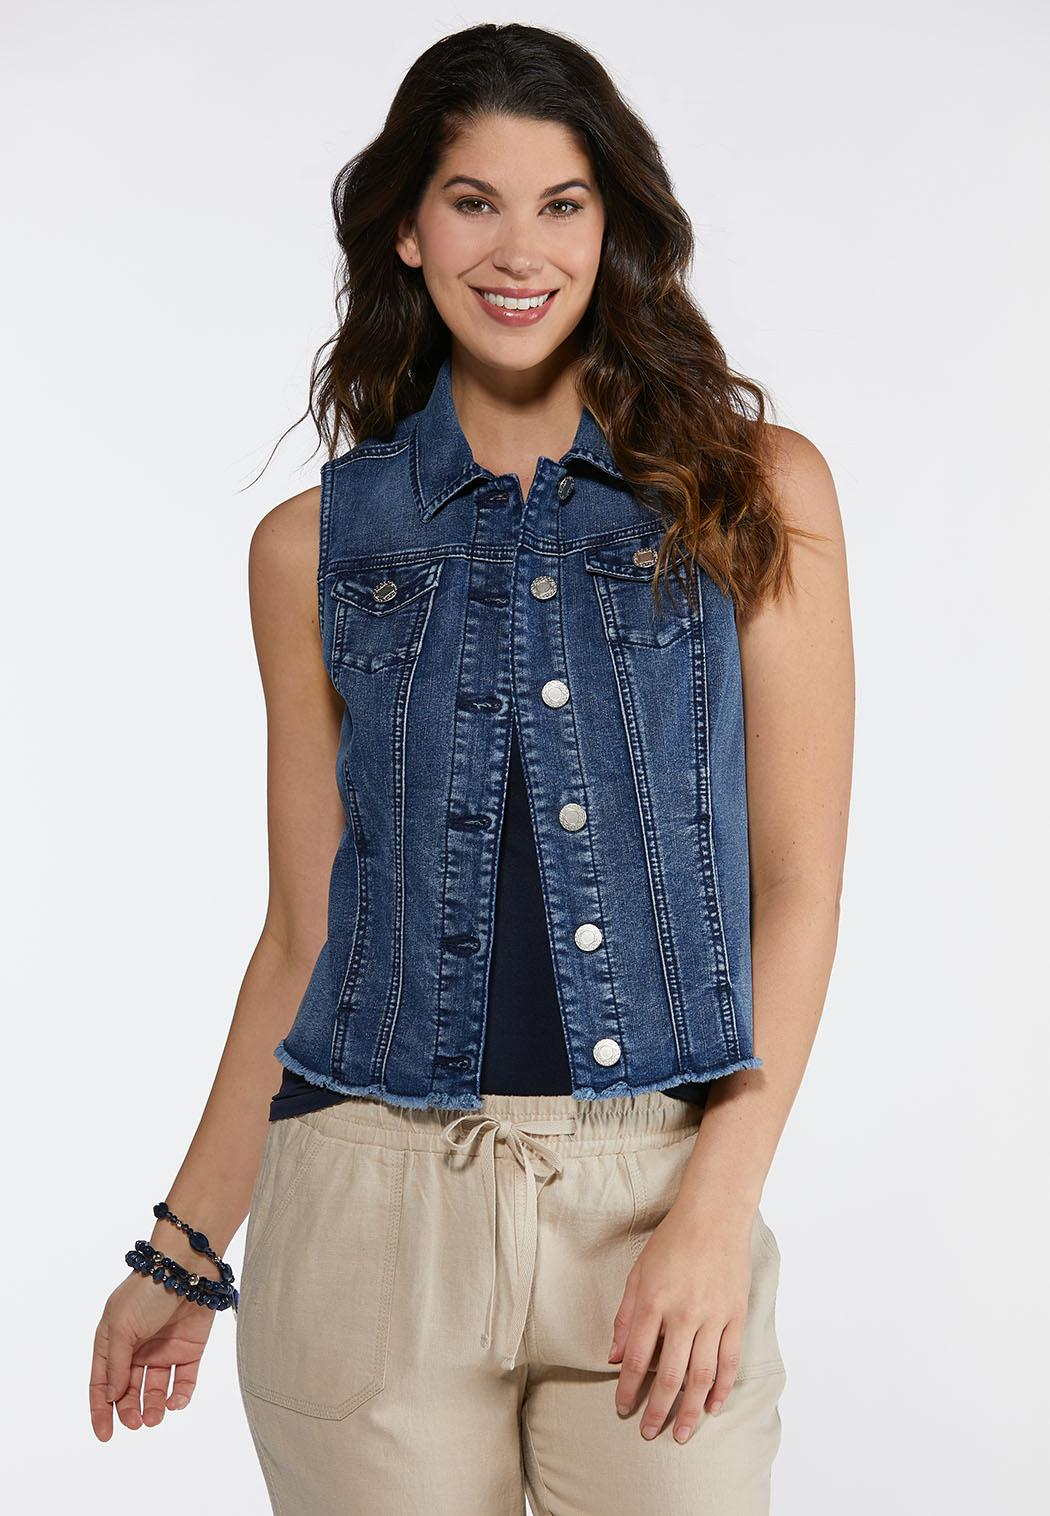 748a3543859b5 Women s Jackets   Vests